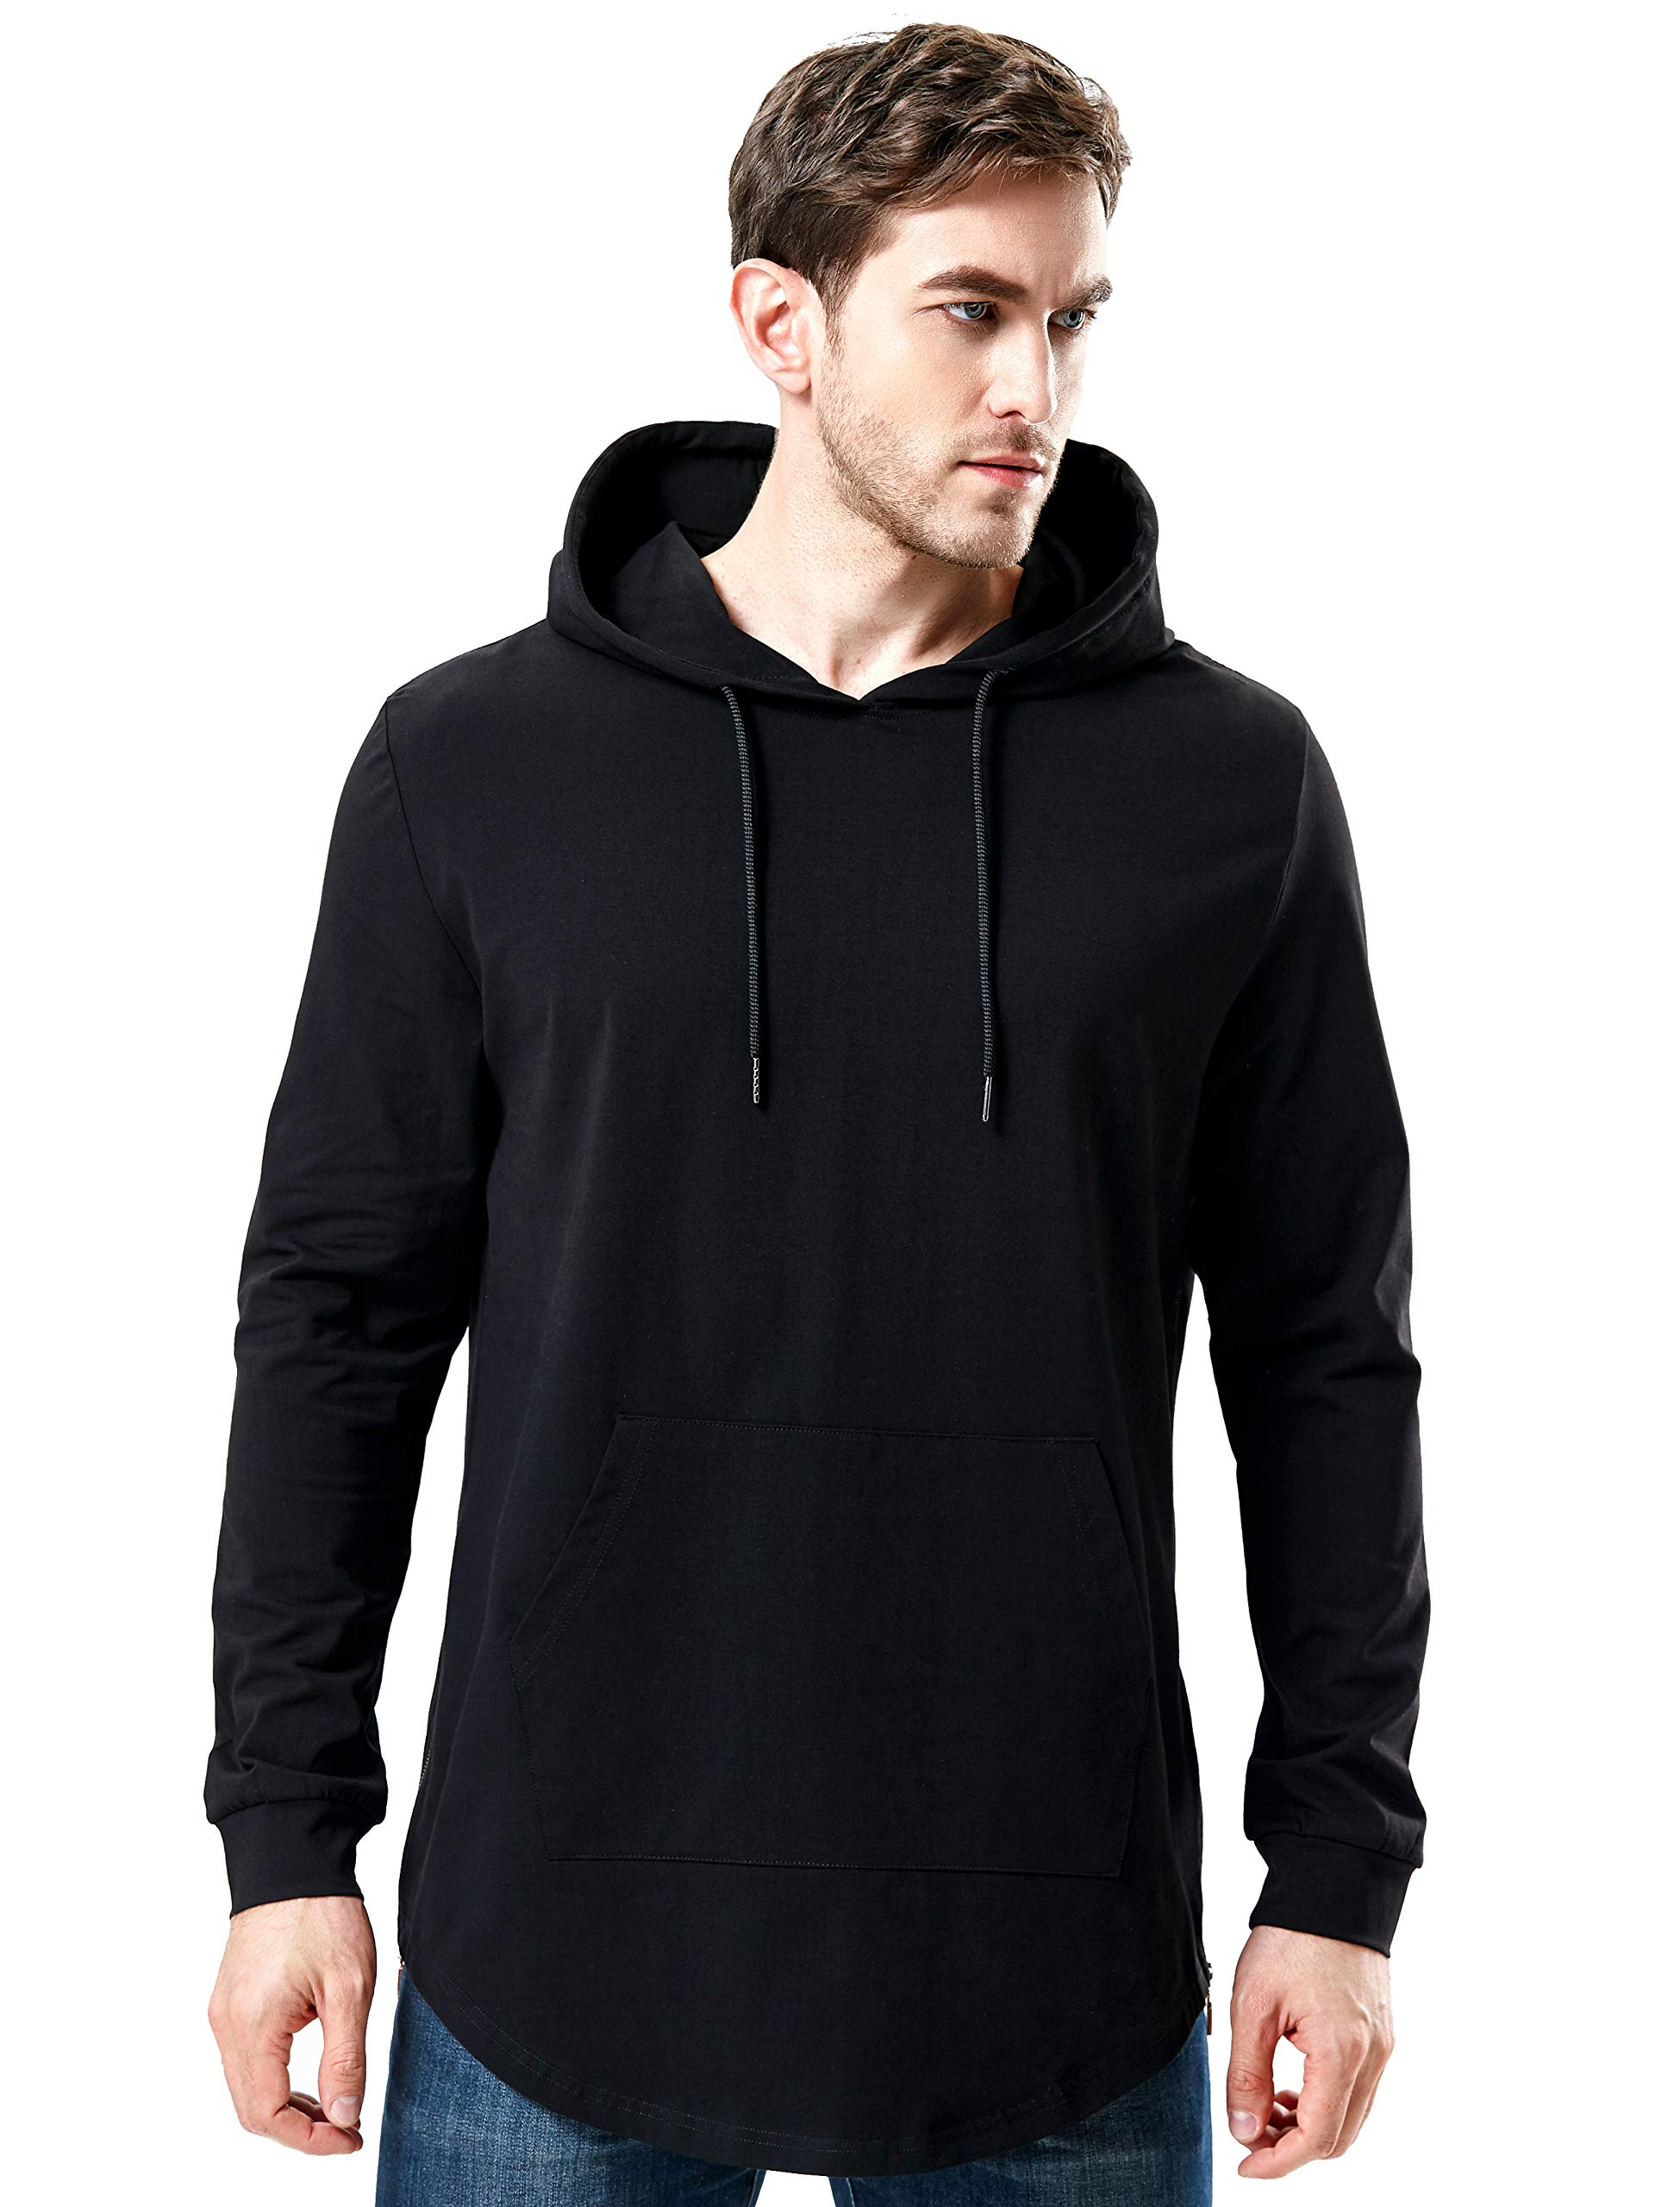 AIYINO Men/'s Hipster Hip Hop Hoodie Side Zipper Tshirt Medium Black